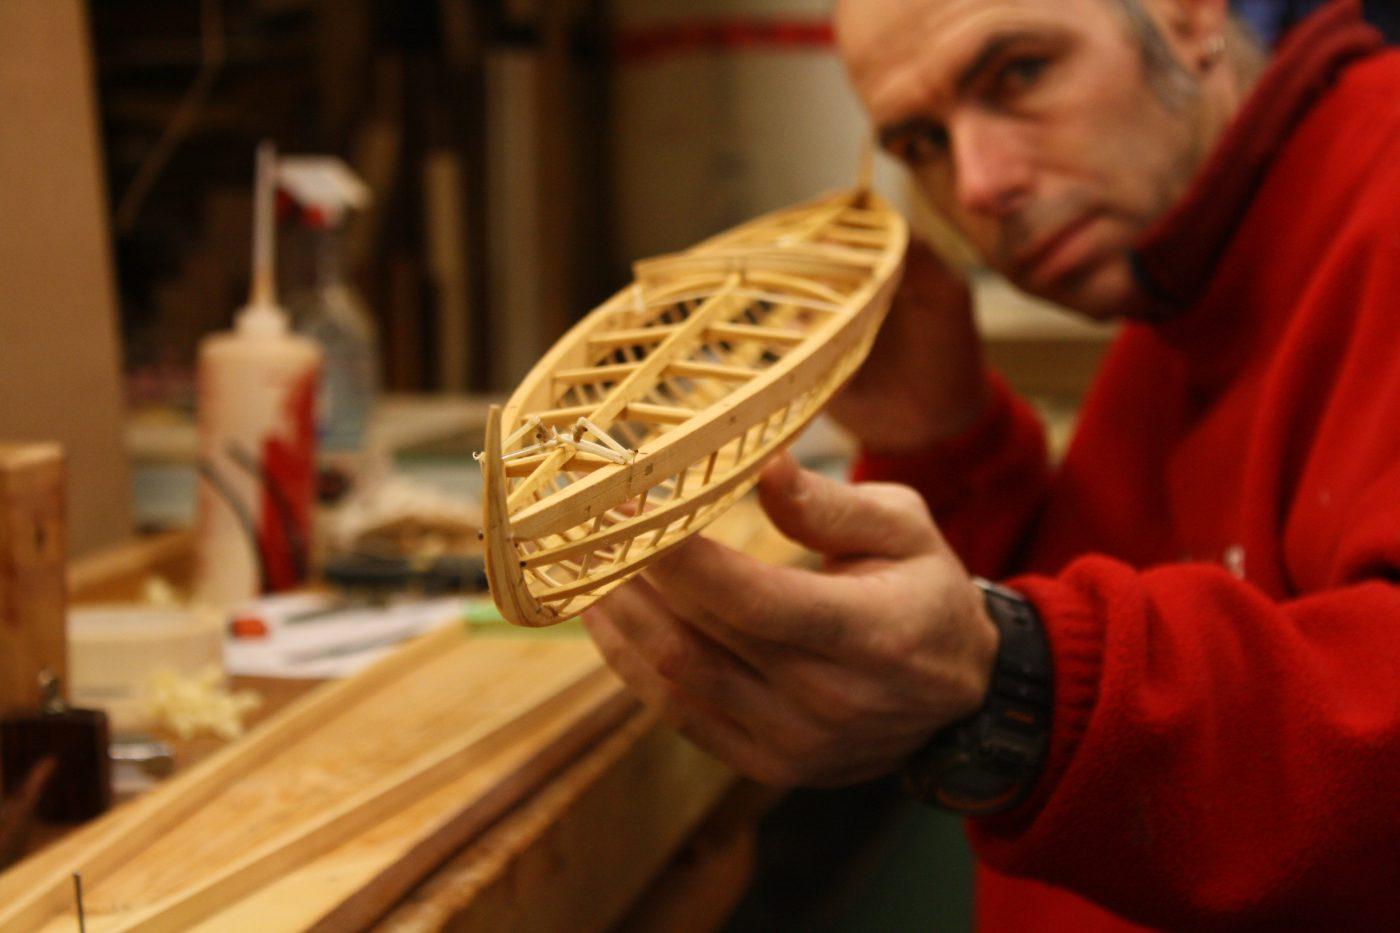 Inuvialuit kayak model